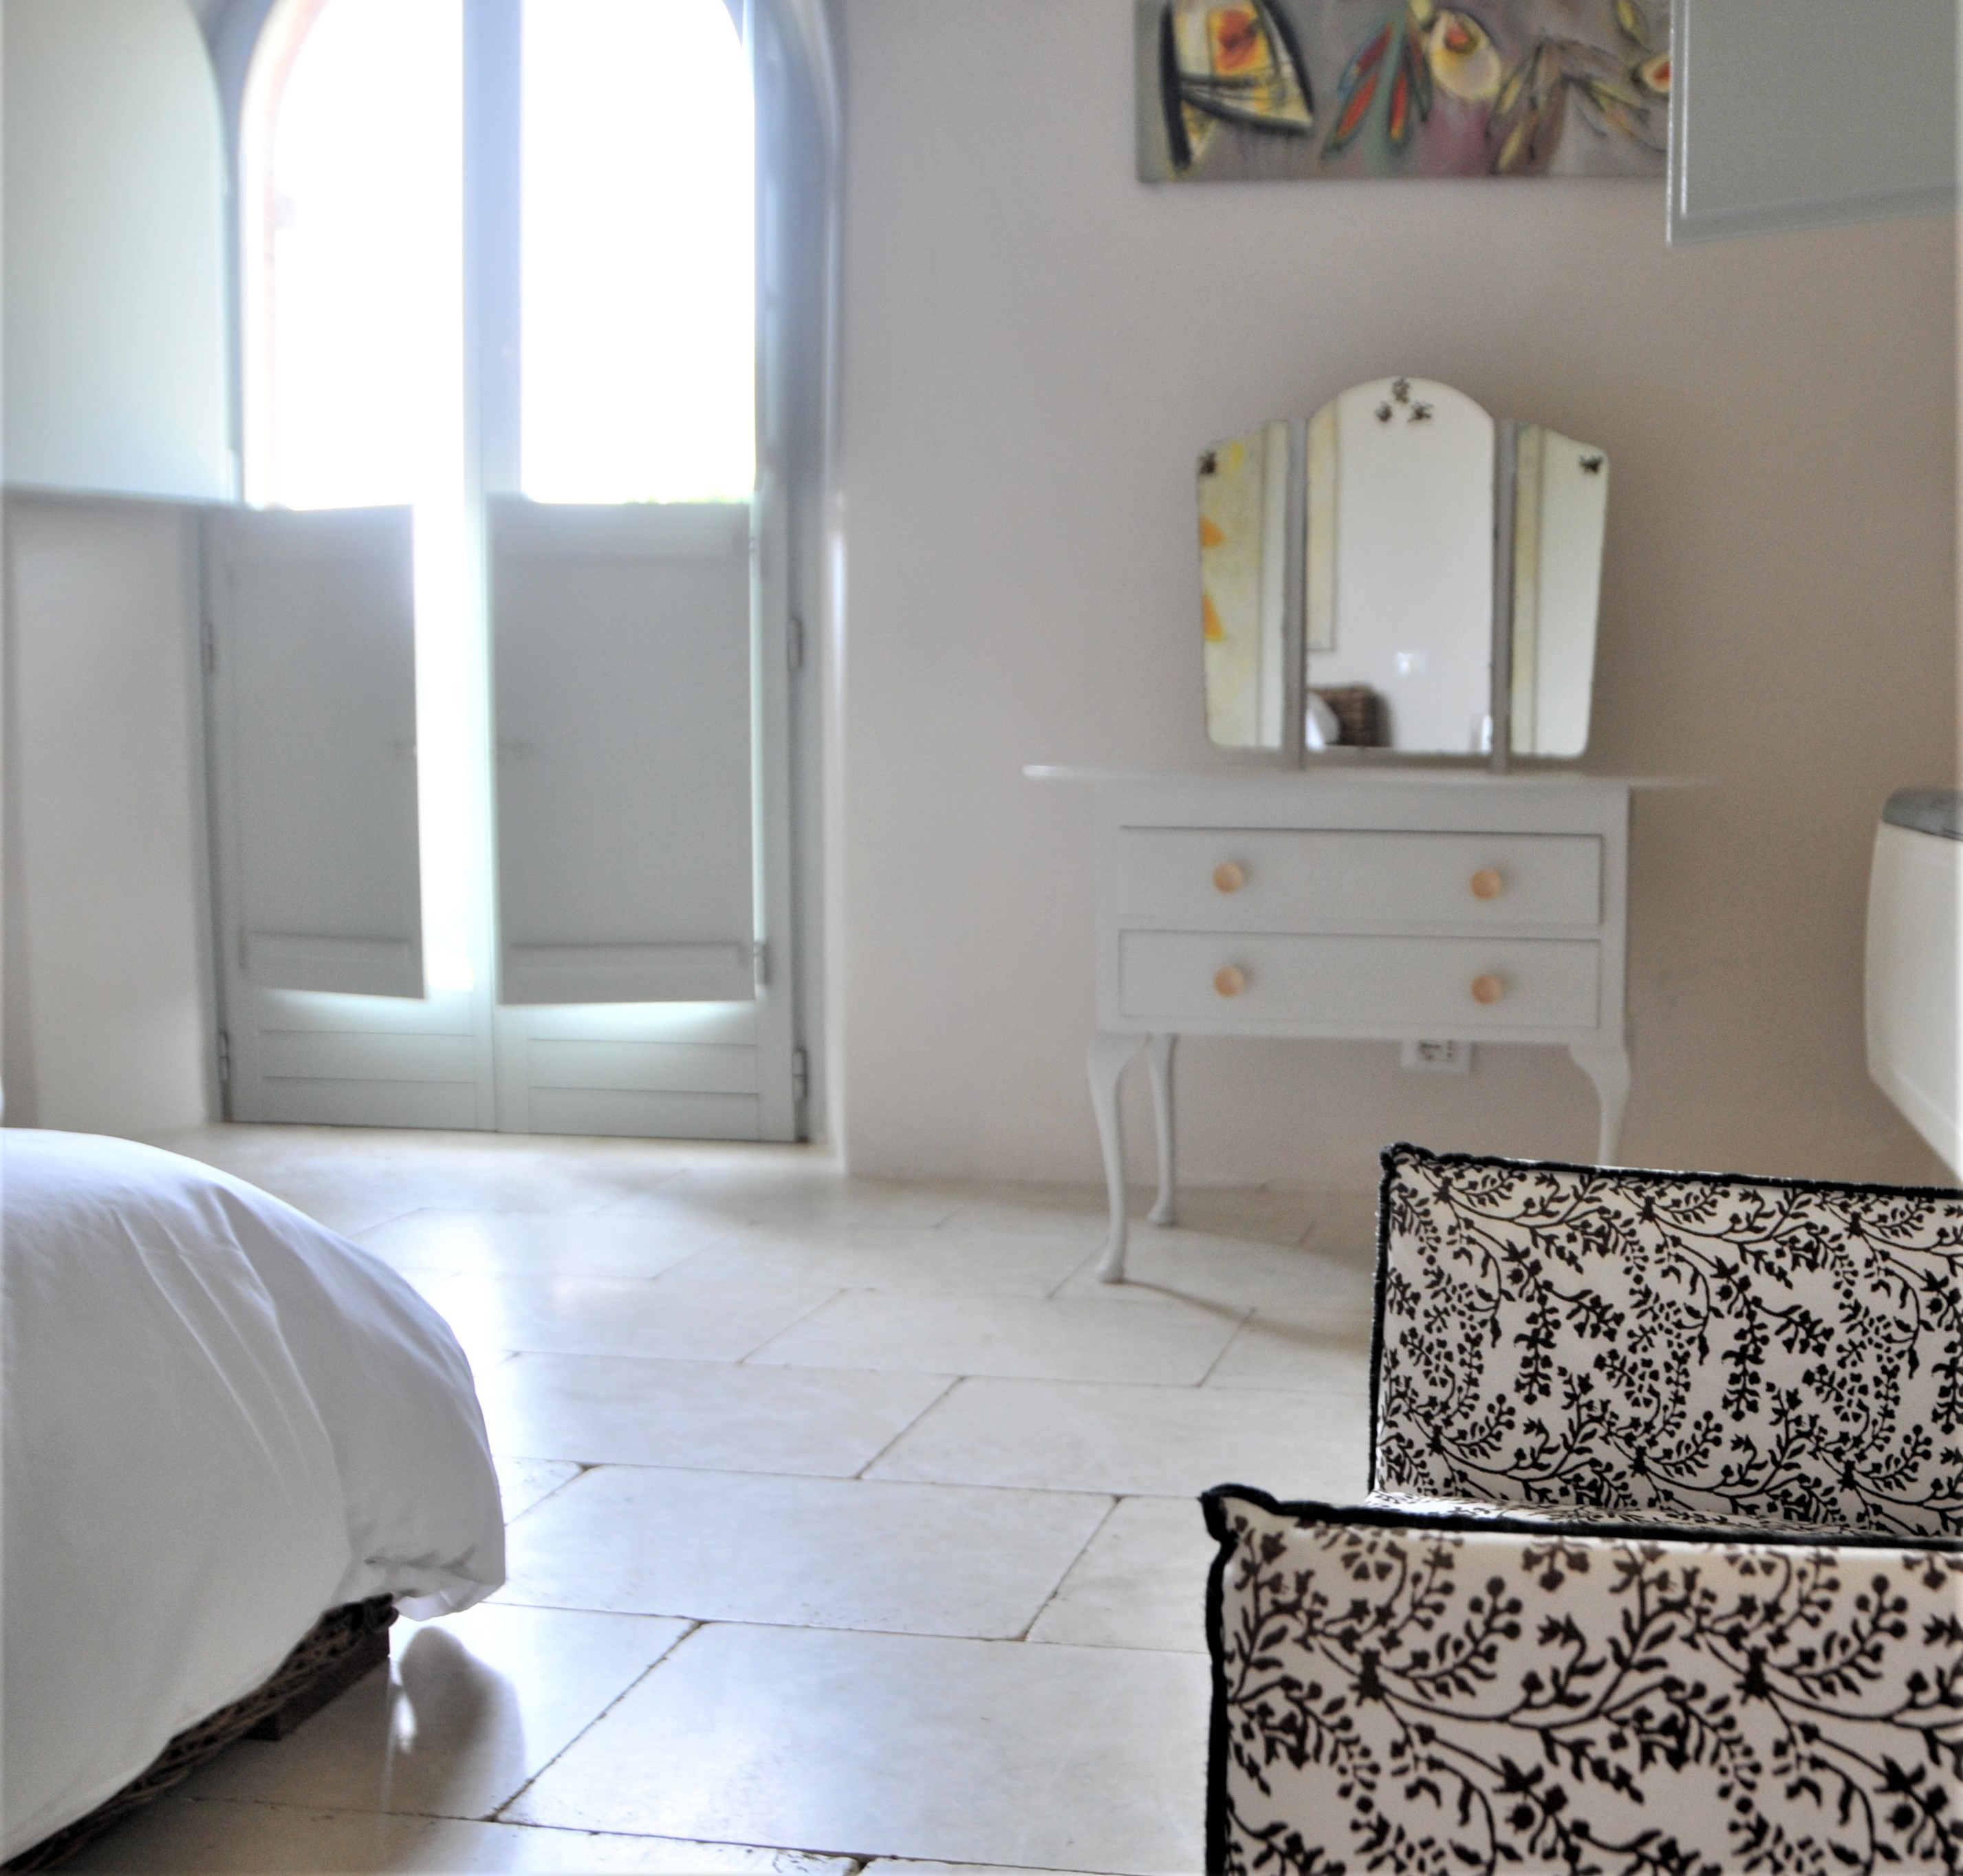 Fidi Interior Design Courses In Florence Italy An: Corso Interior Design Firenze